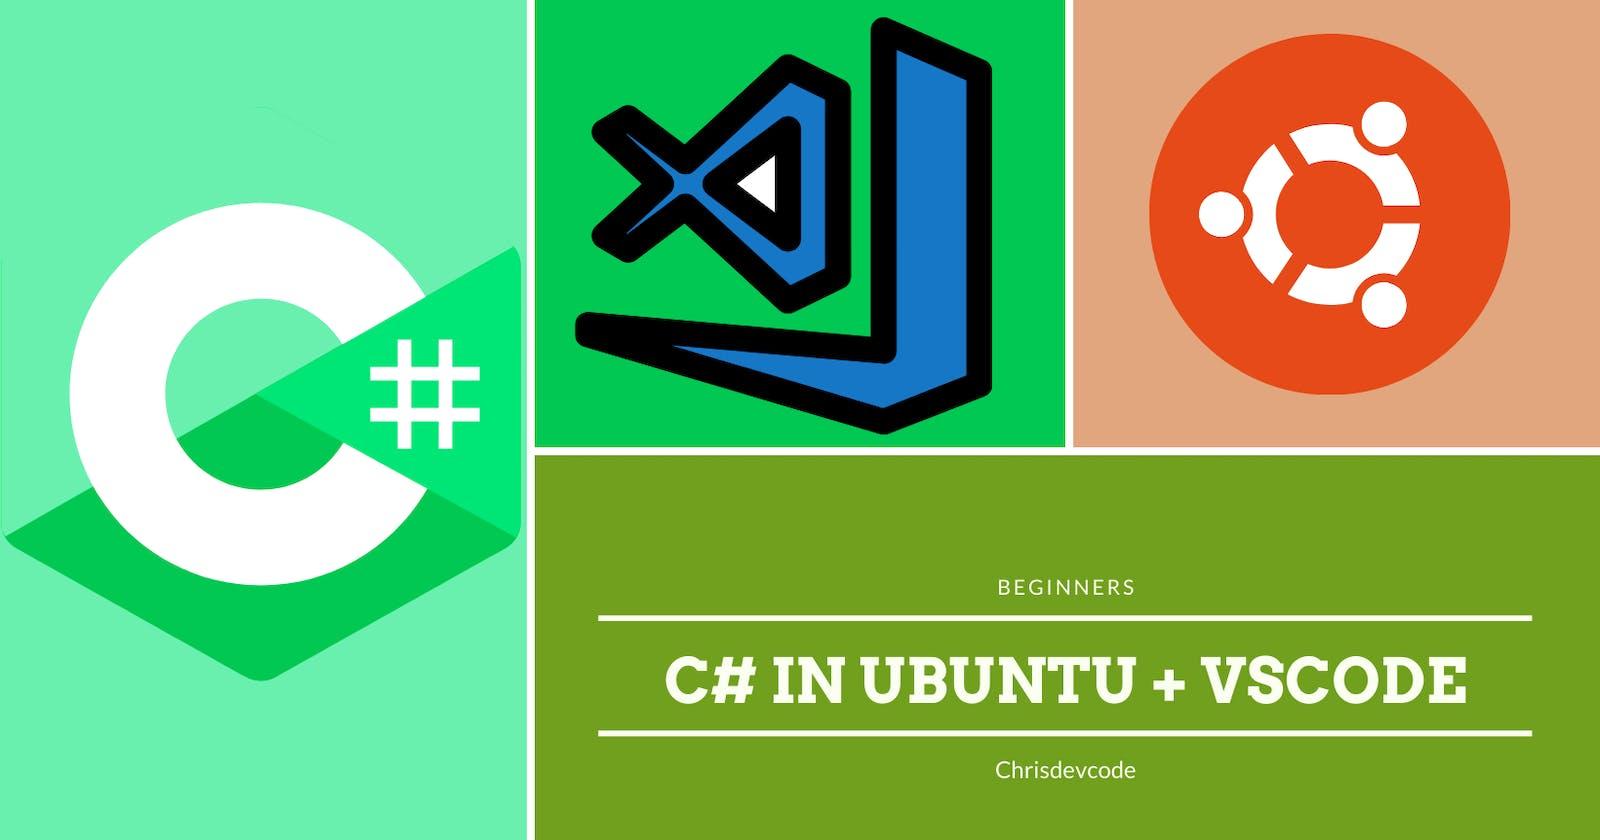 C#(Dotnet) Setup in Ubuntu with VSCode